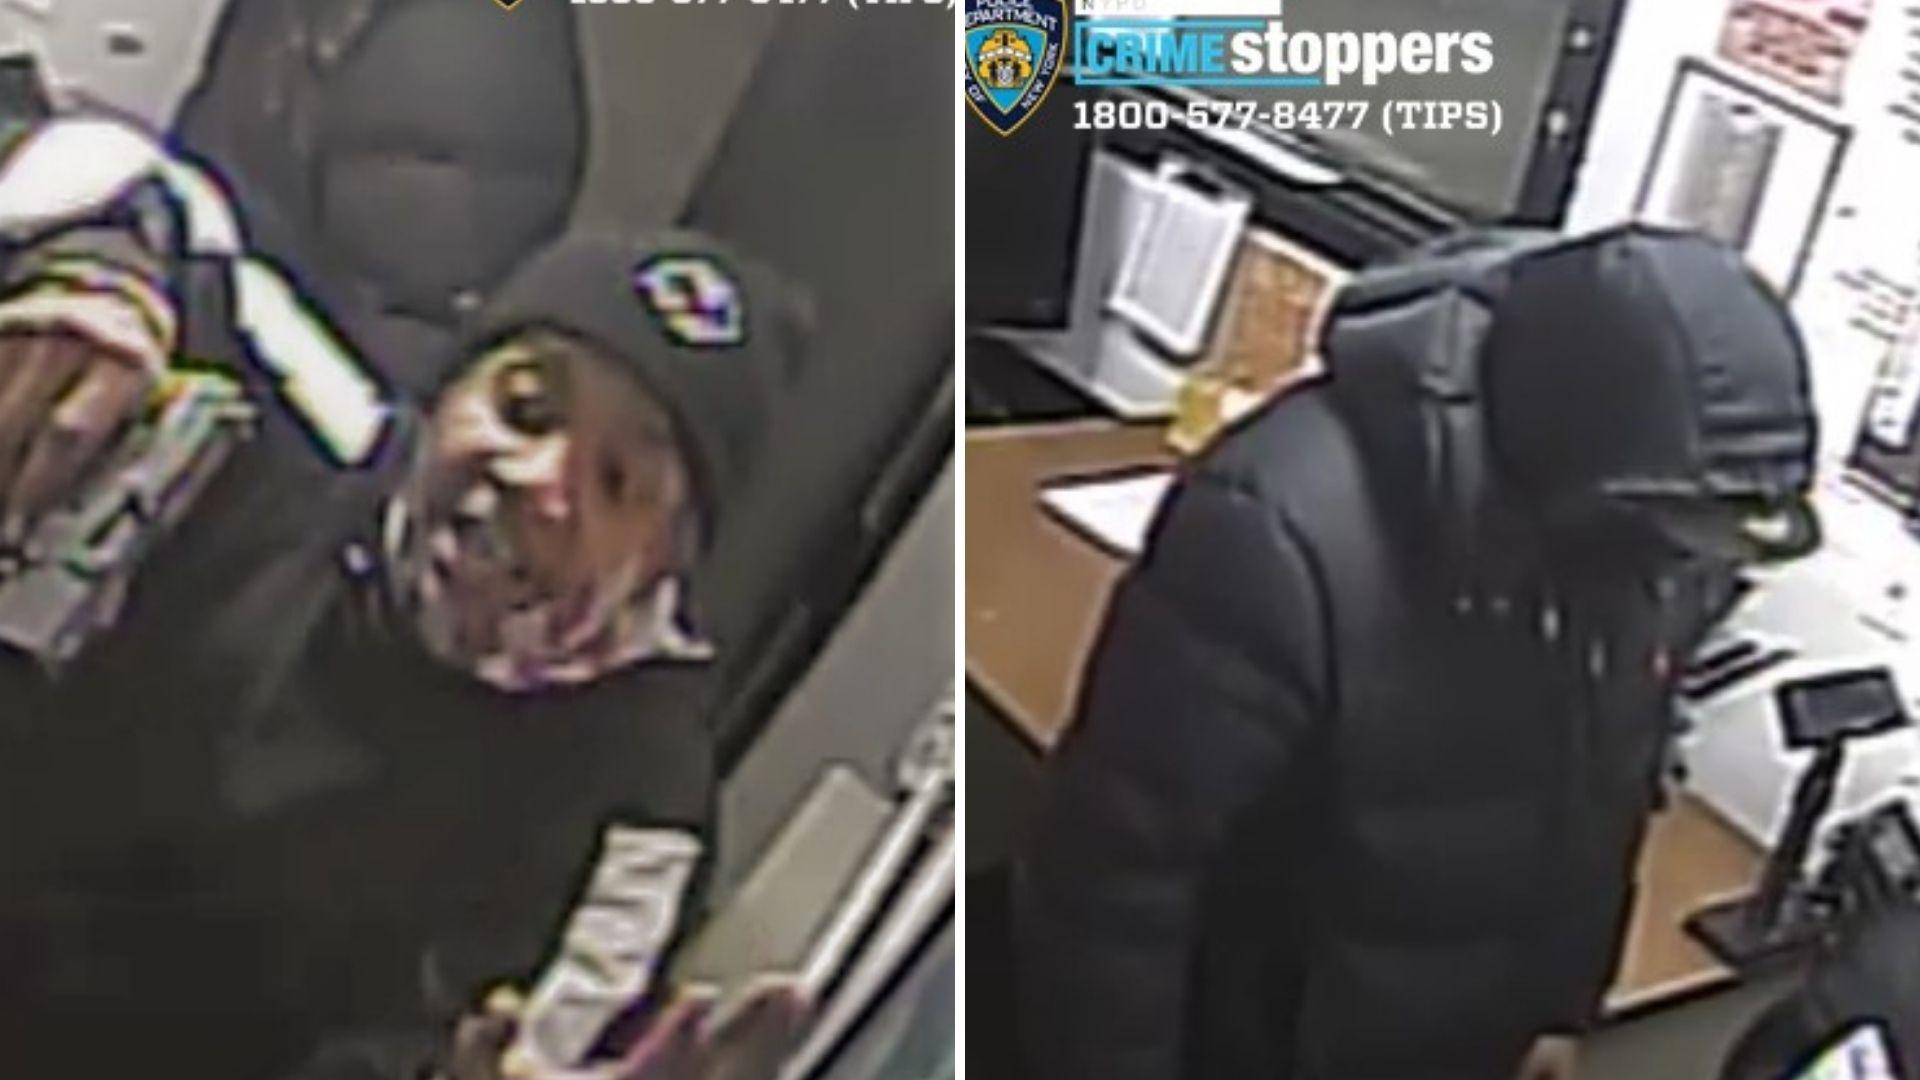 Washington Heights parking garage robbery